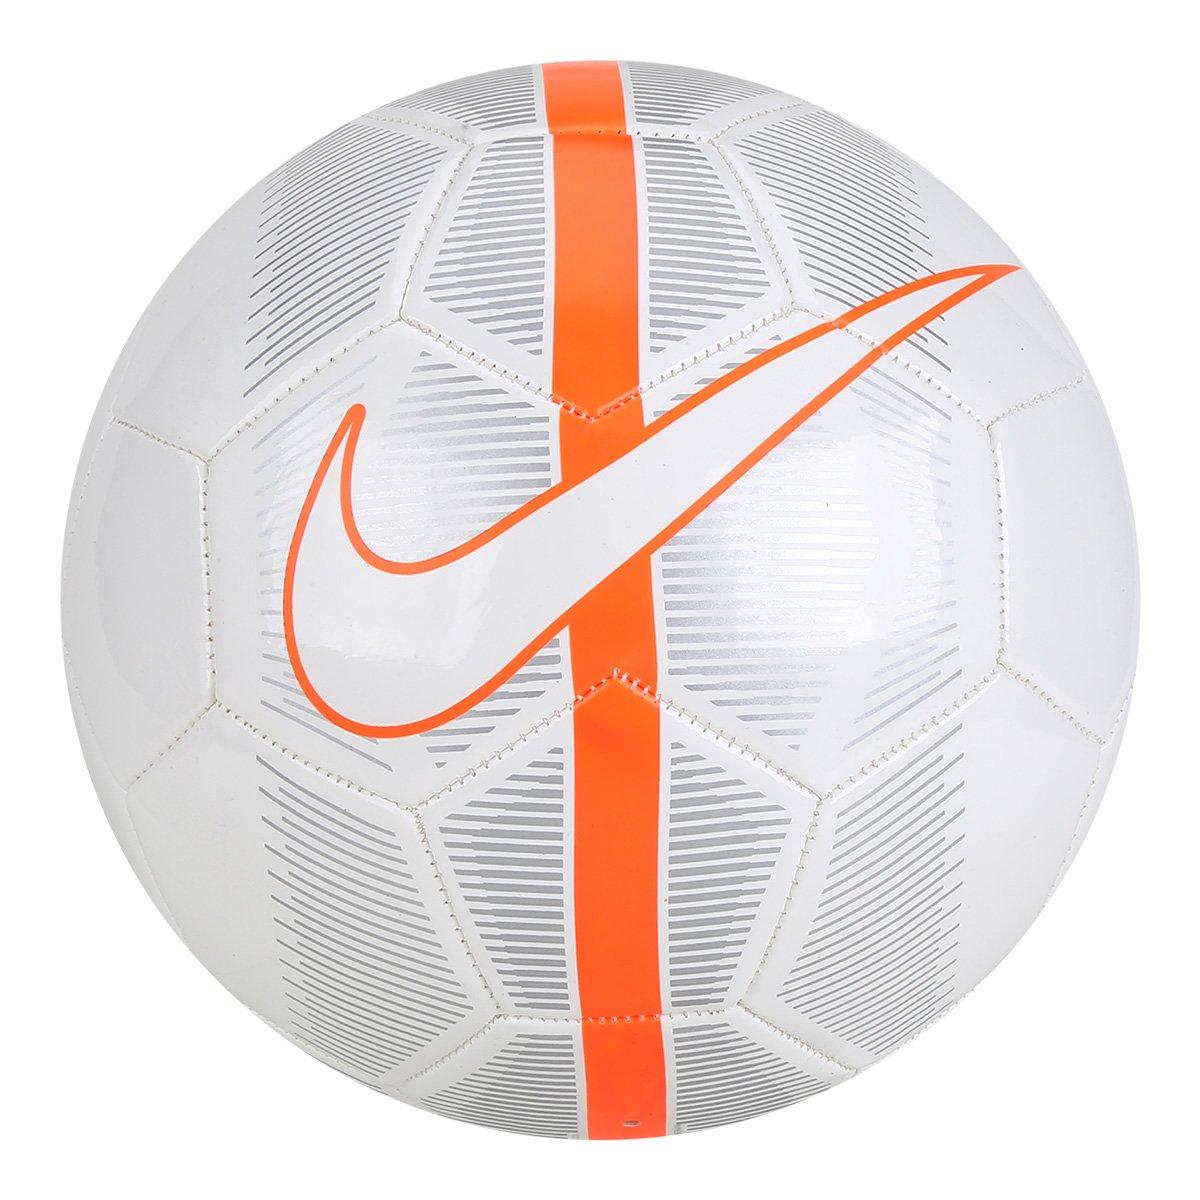 Bola Futebol Campo Nike Mercurial Fade - Branco e Cinza - Compre ... 2b691b2d9a4e6